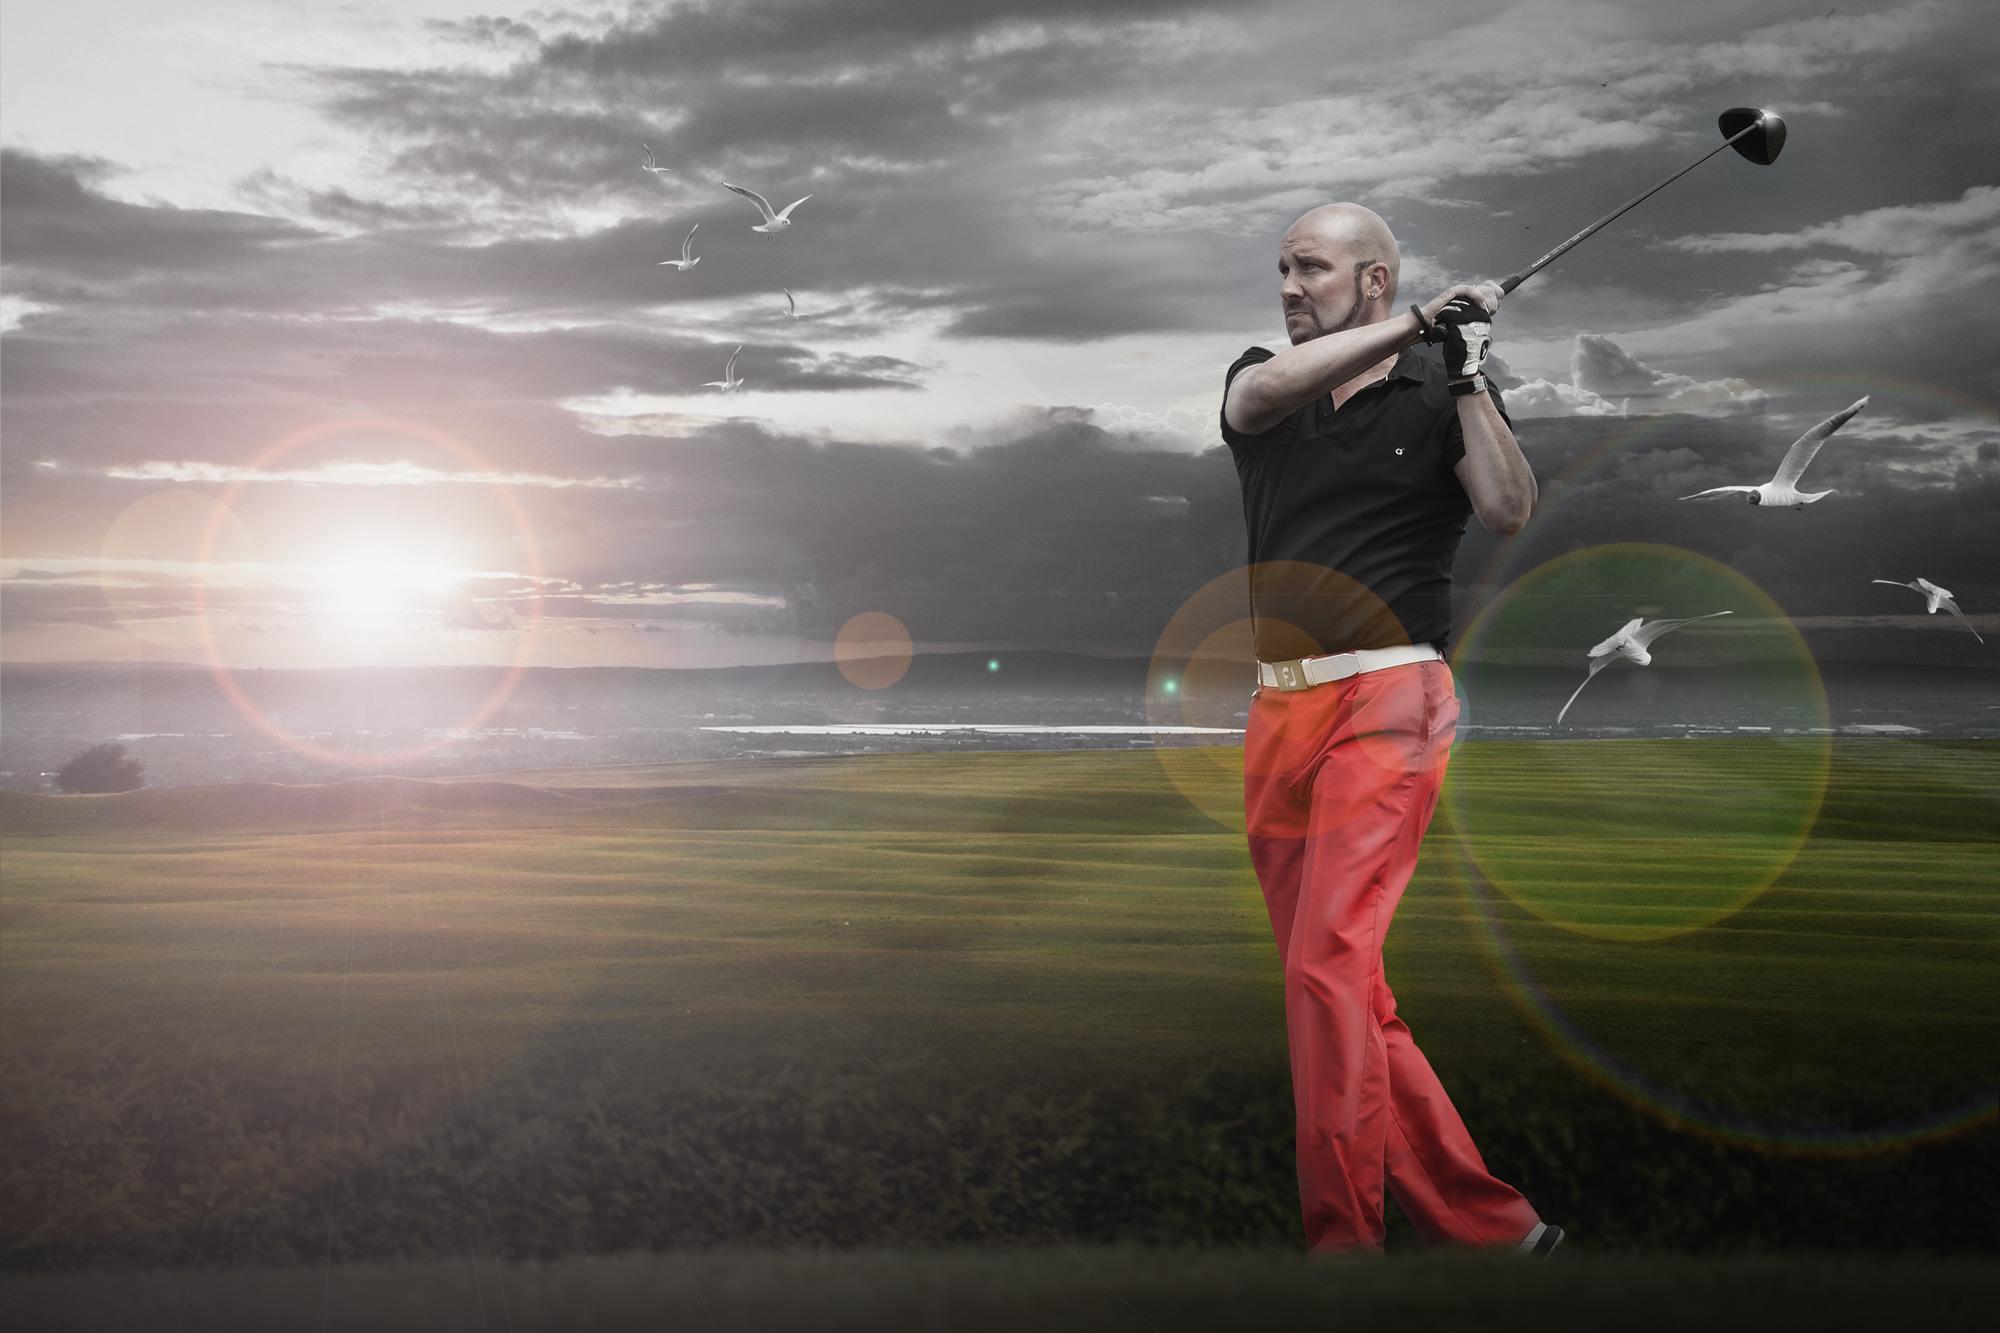 Golfspieler im GC Röttgersbach